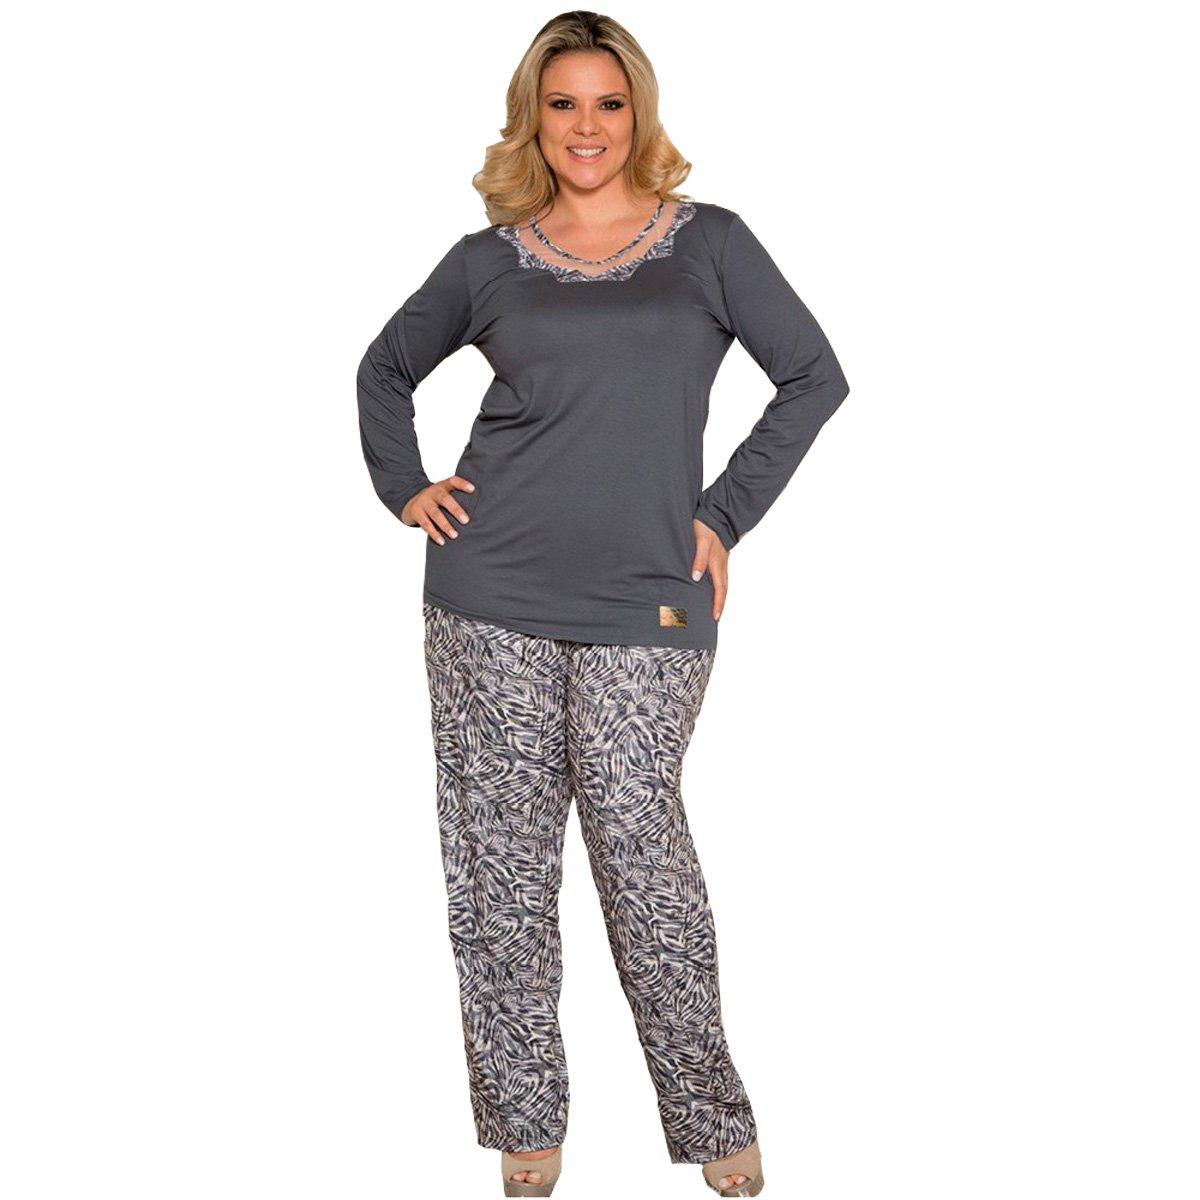 c99d8a407 Bizz Store - Pijama Feminino Inverno Recco Manga Longa 08370